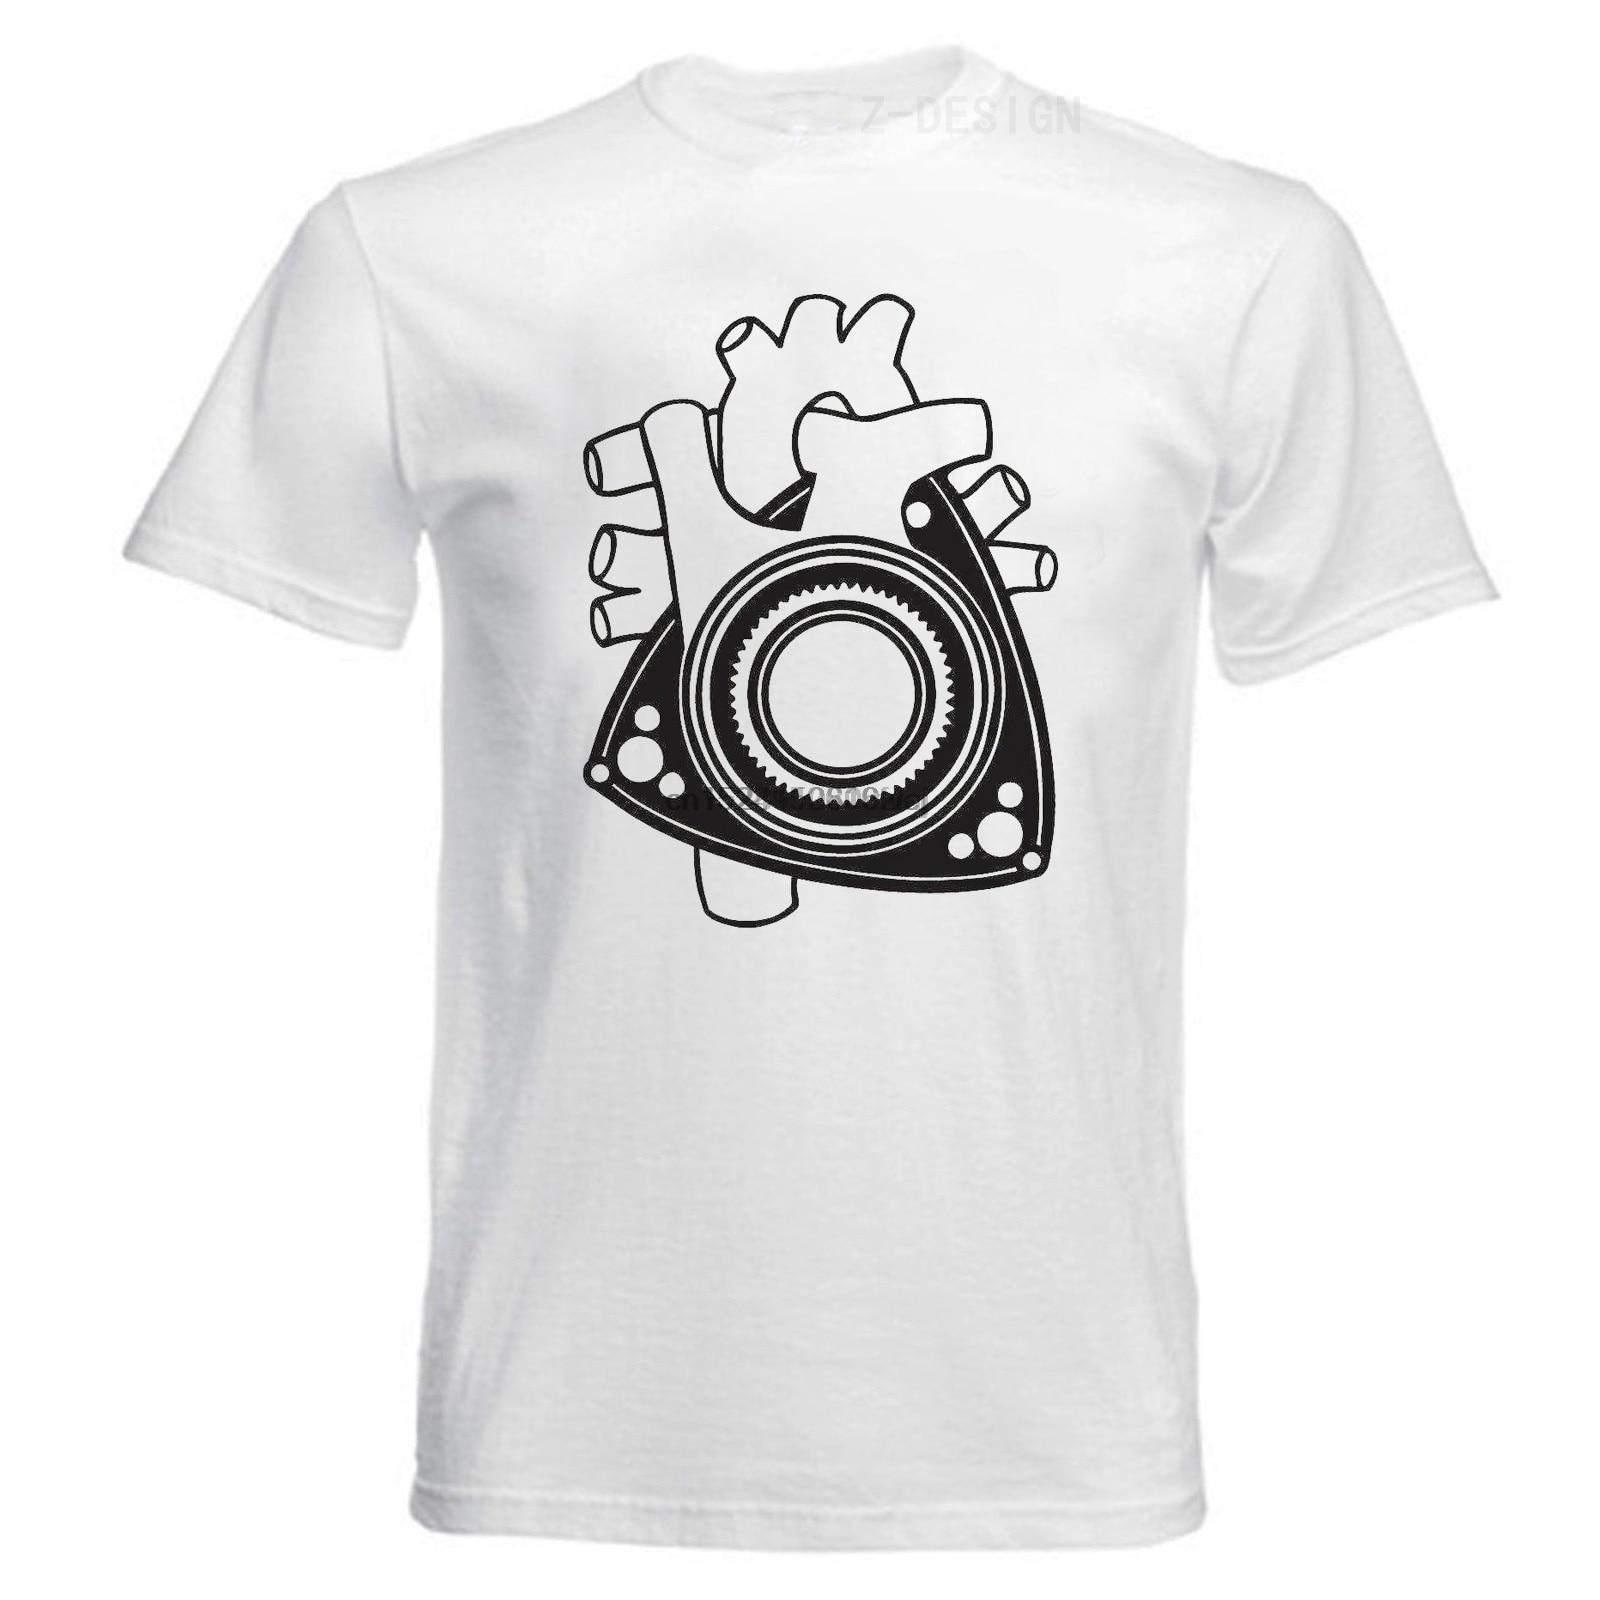 LEFEDA Mazda Rotary Engine Wankel Heart Graphic Tee Shirt Mens Shirt Cotton Shirt Casual T Shirt White S-XXXL Rx-6 Rx-7 Rx-8(1)